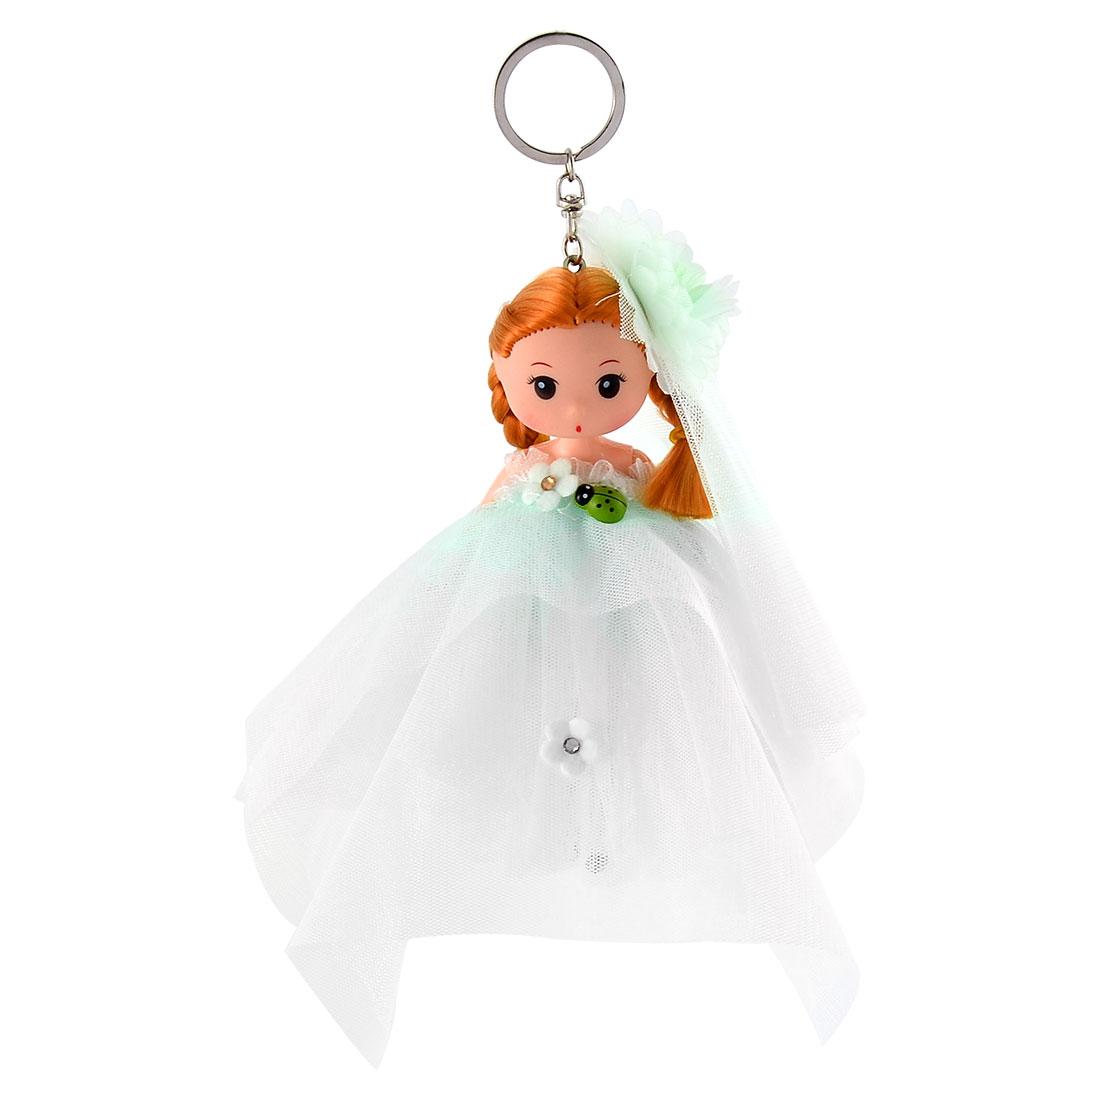 Lady Handbag Innocent Girl Ornament Strap Pendant Doll Keychain Key Ring Green